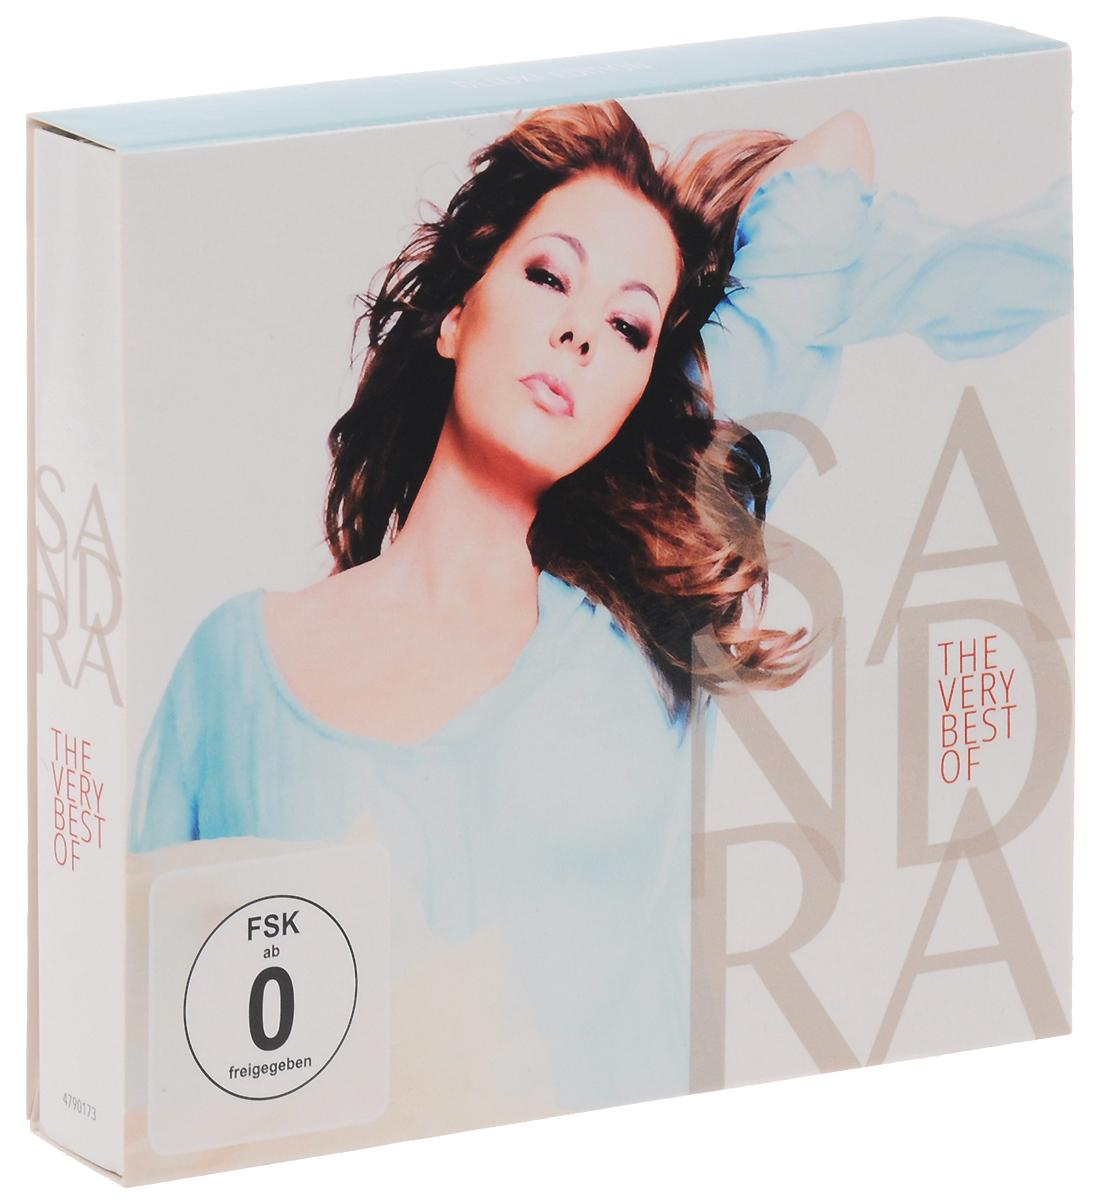 Sandra. The Very Best Of Sandra. Deluxe Edition (2 CD + DVD)